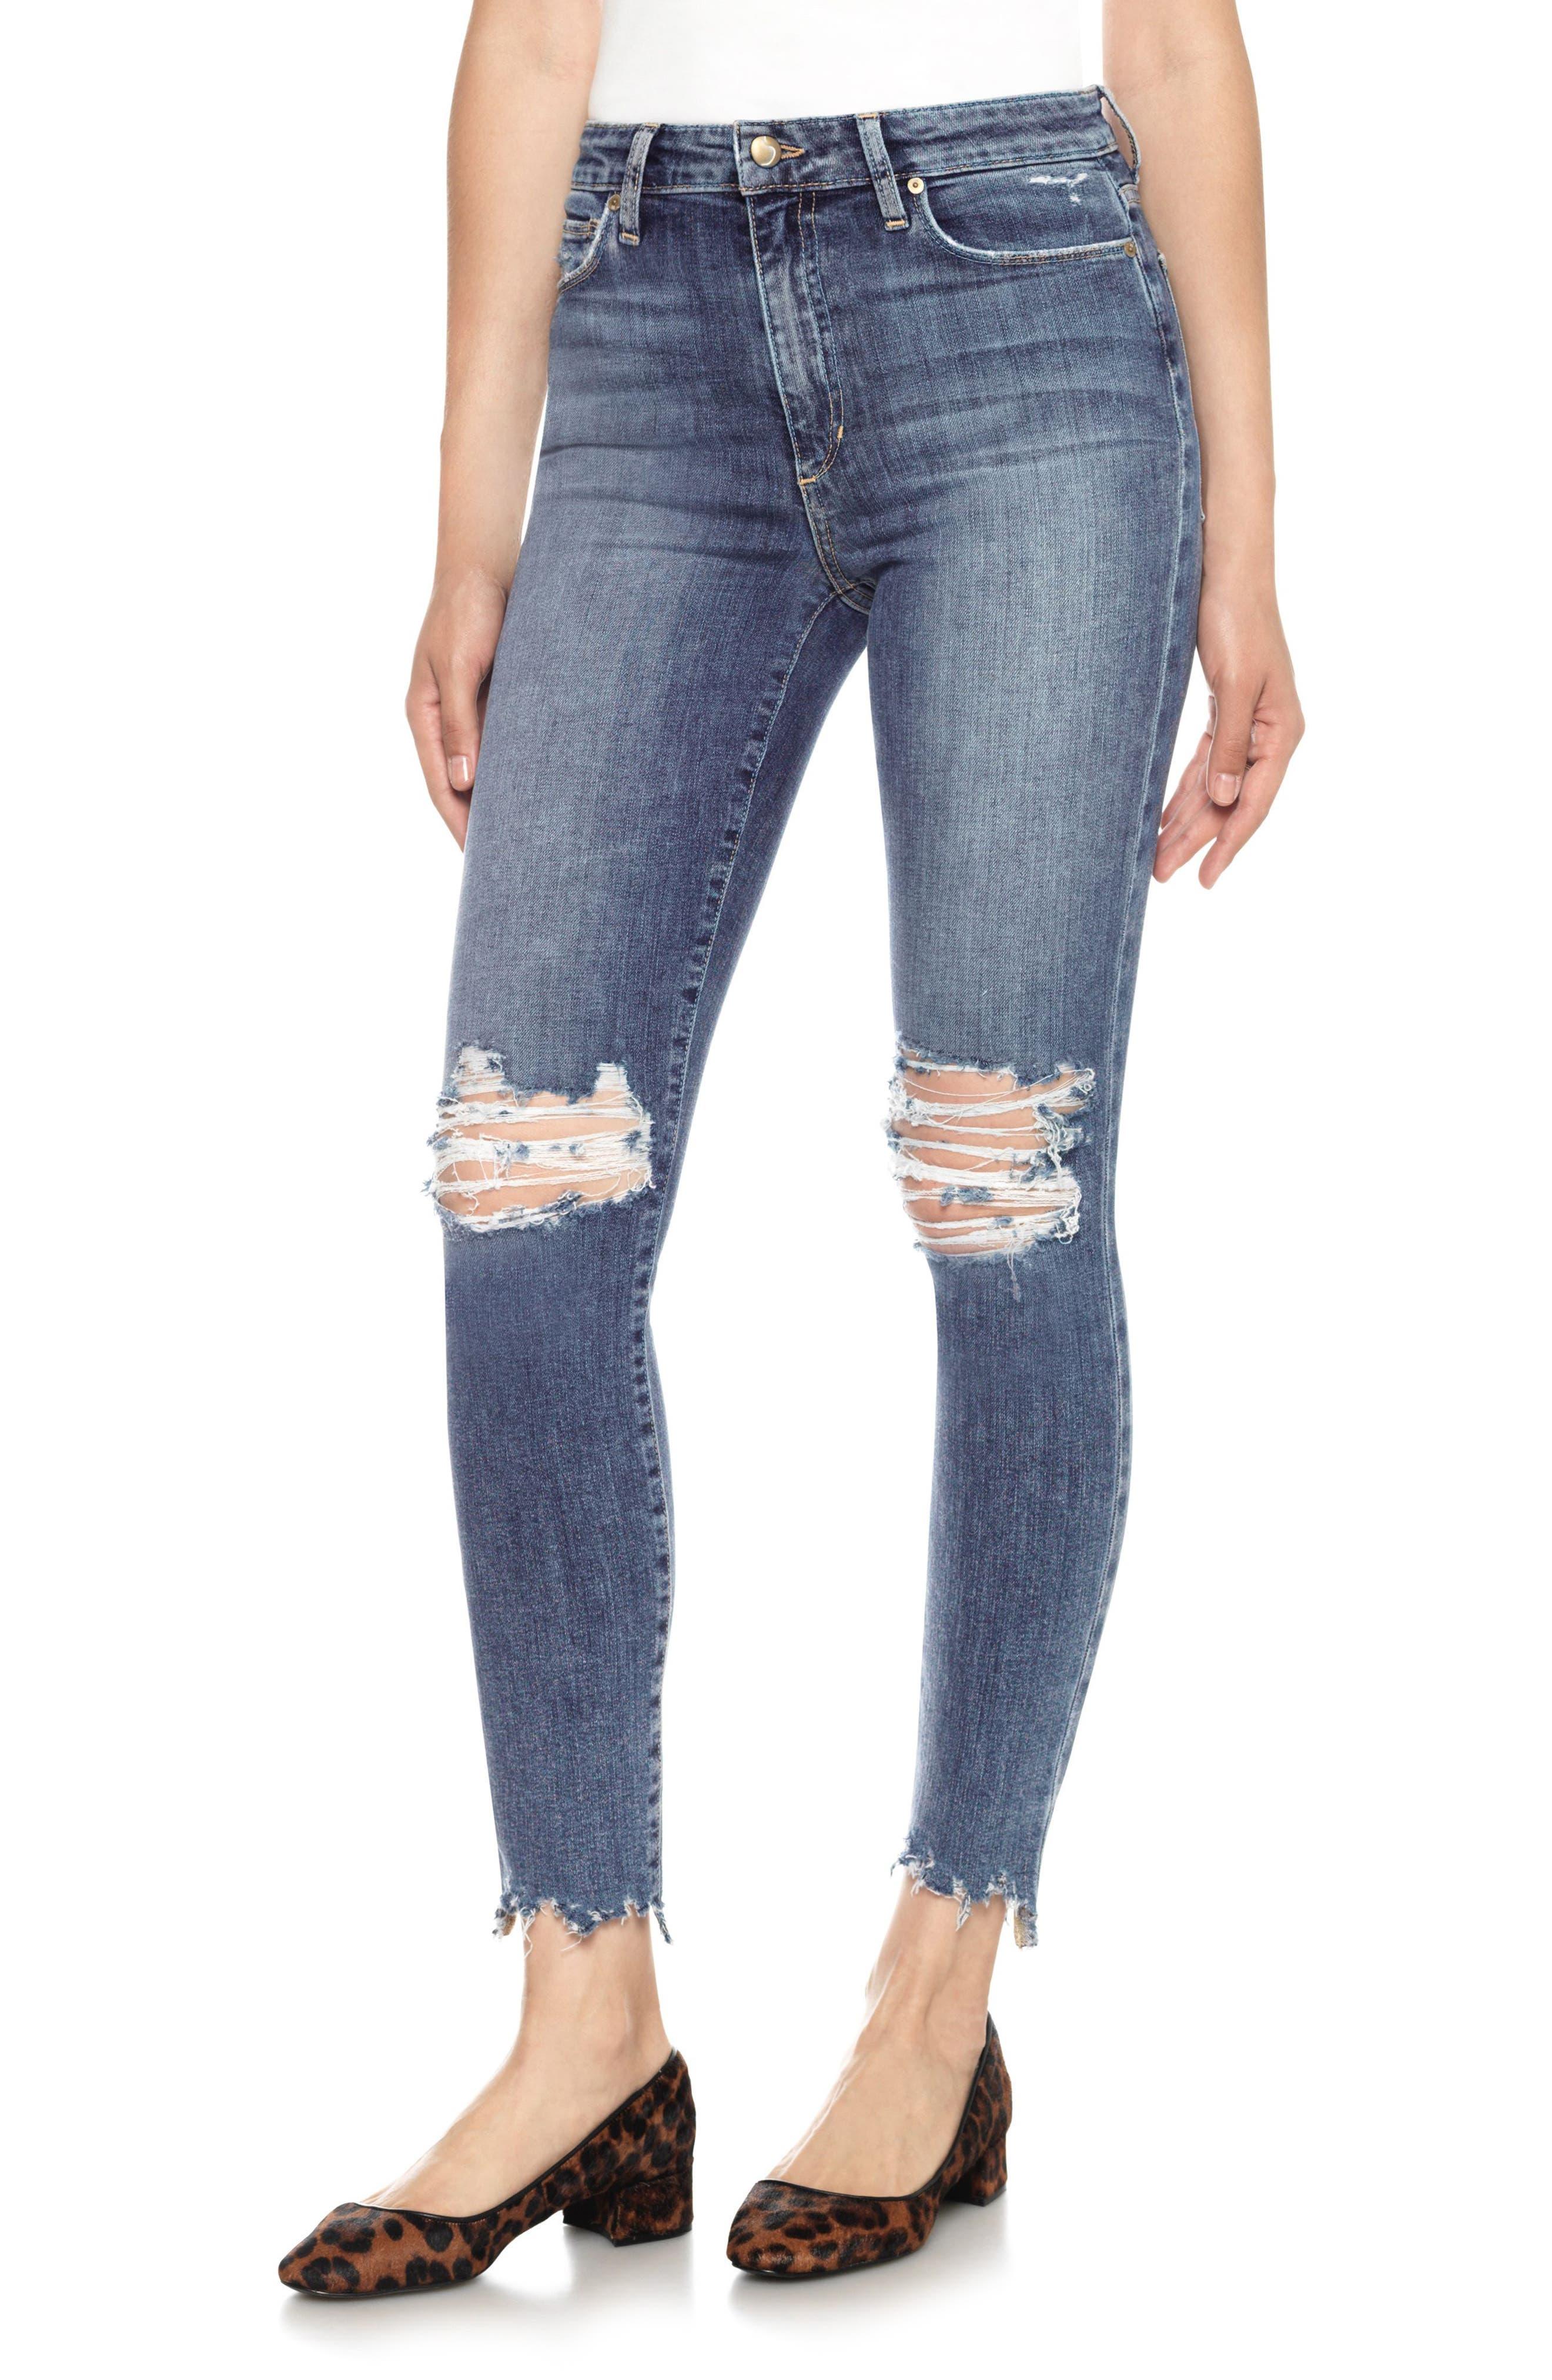 Alternate Image 1 Selected - Joe's Charlie High Waist Ankle Skinny Jeans (Lonnie)